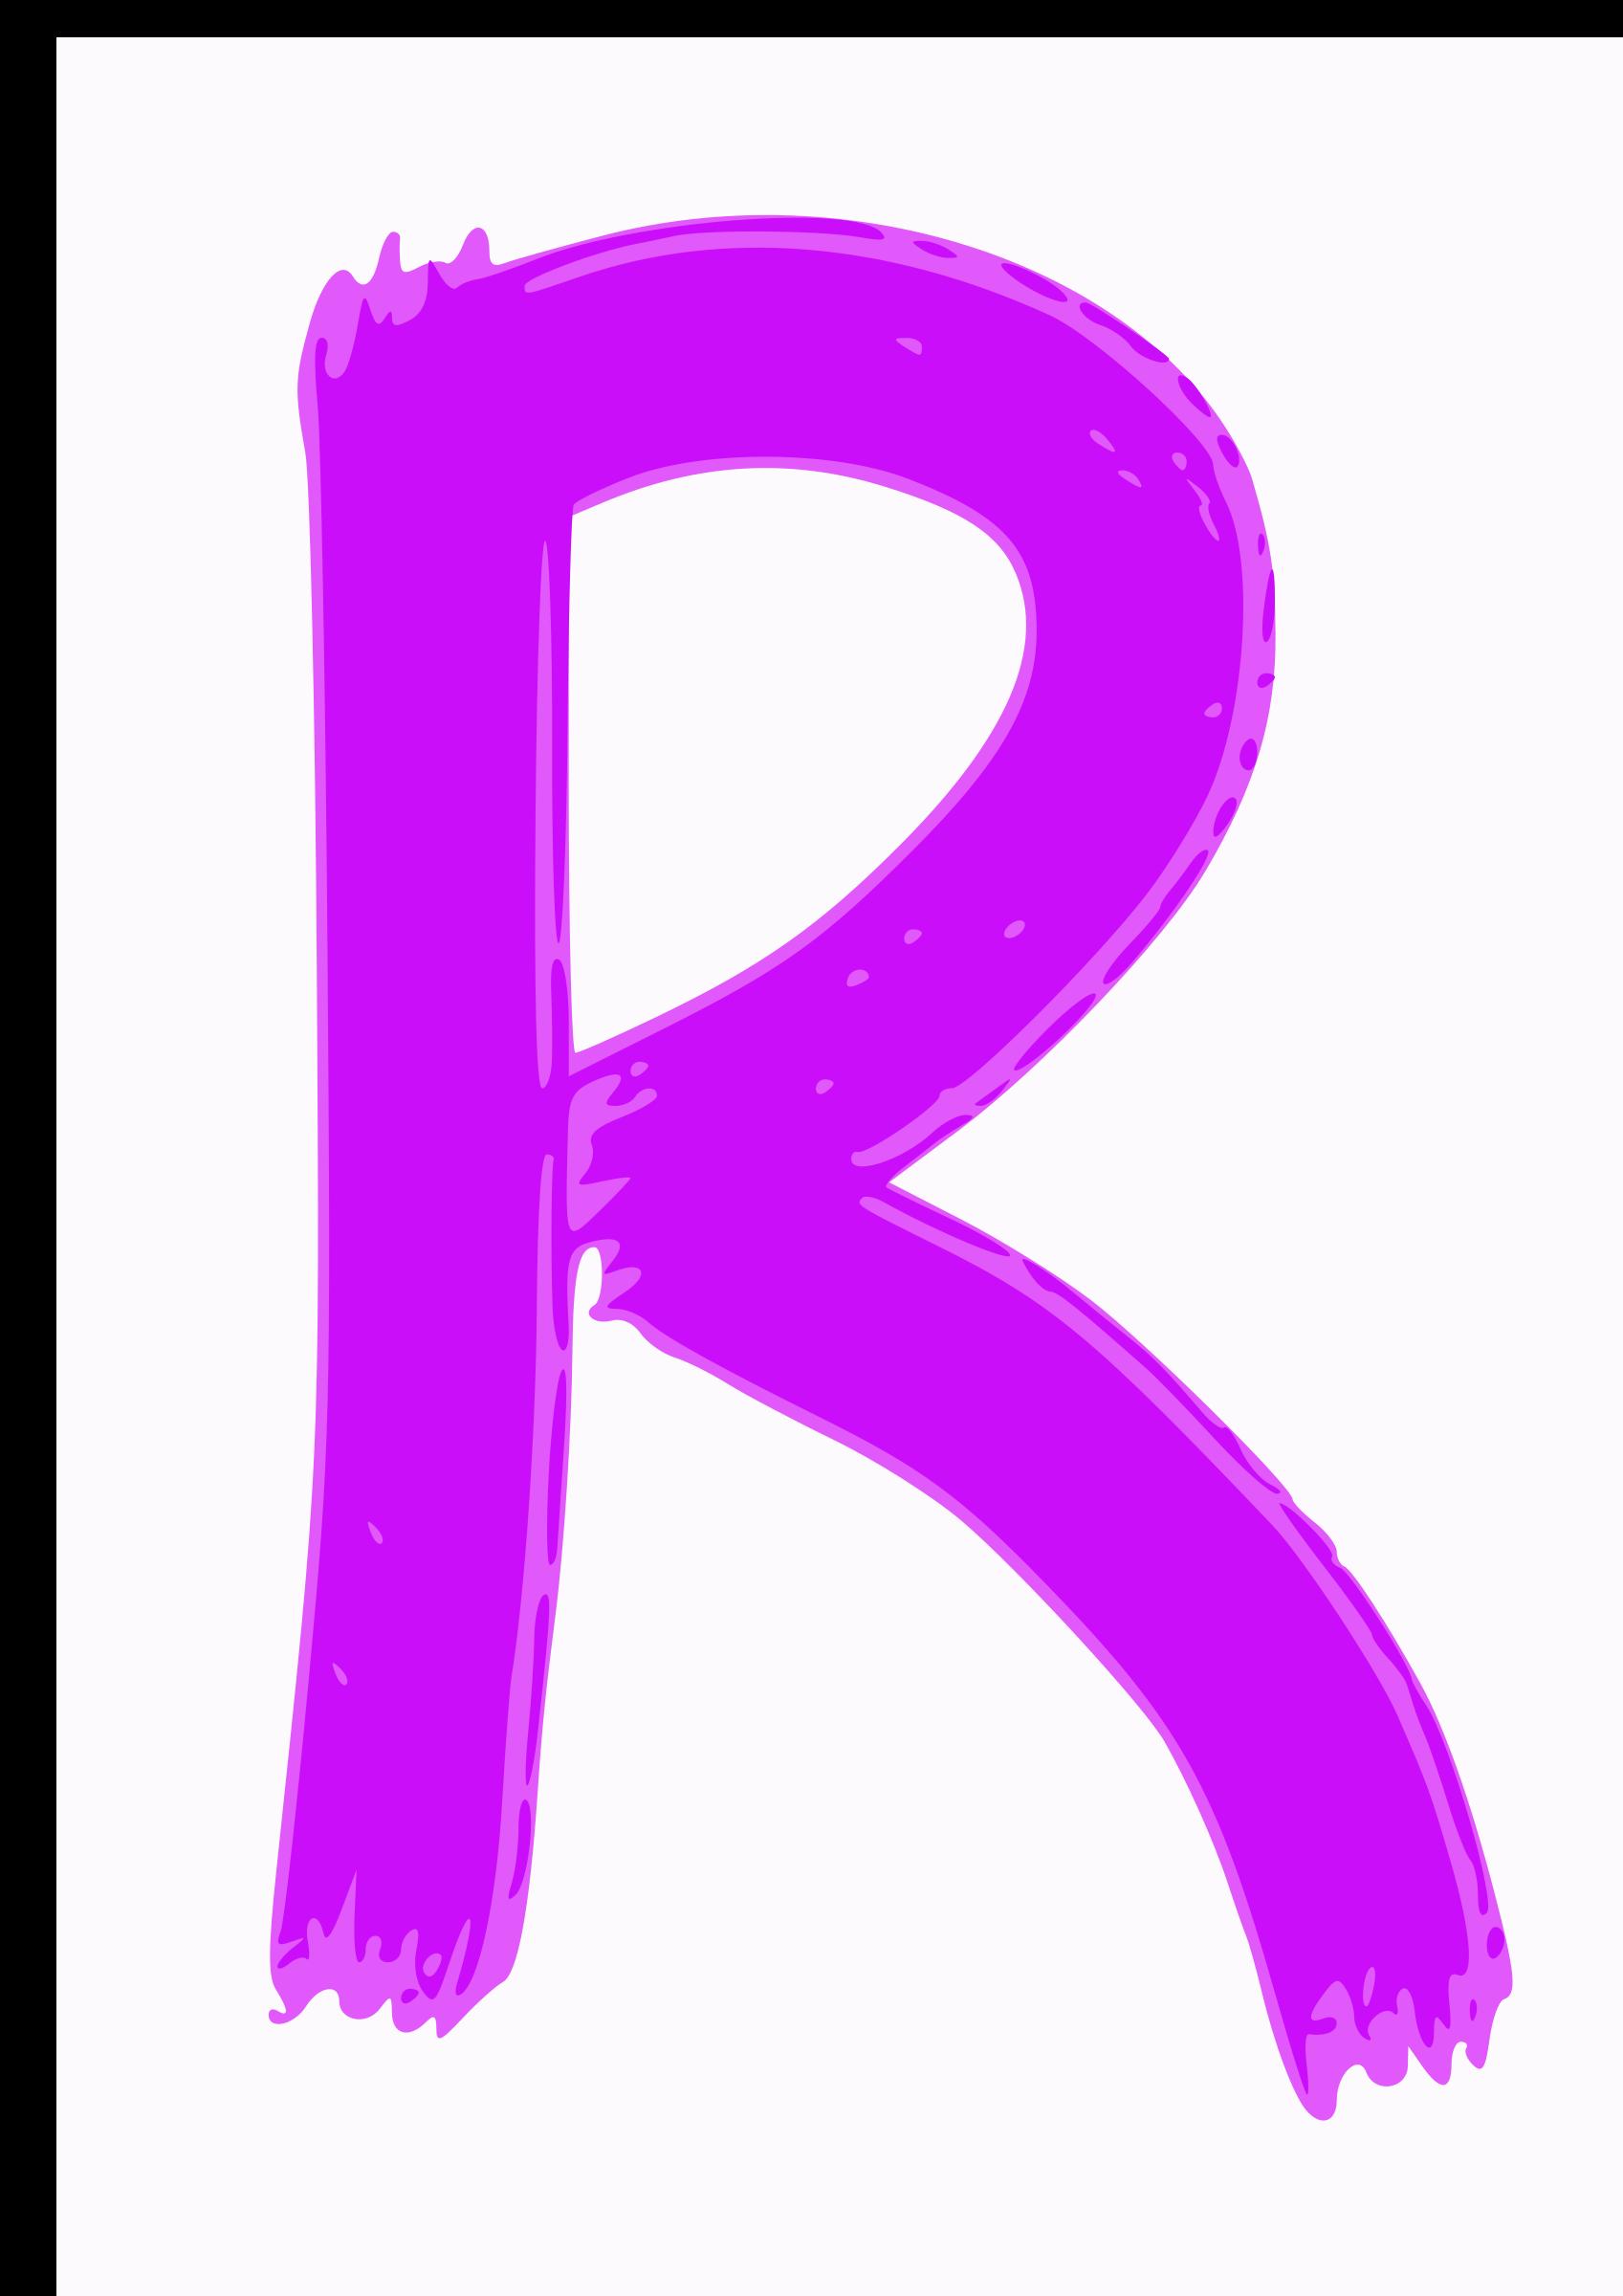 Big image png. R clipart